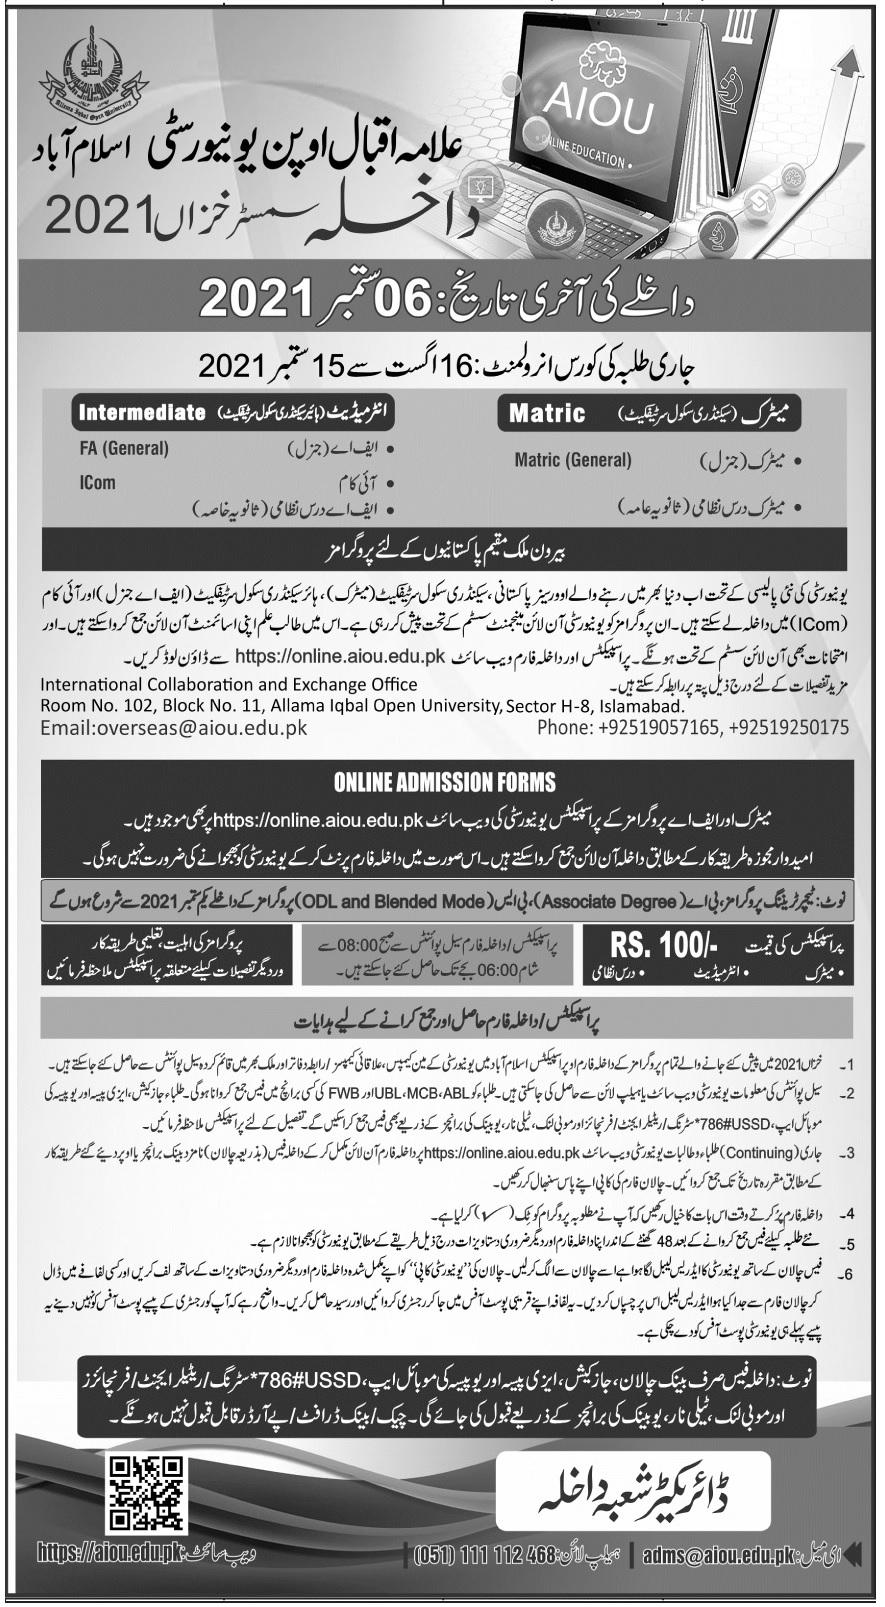 Aiou Islamabad Admissions